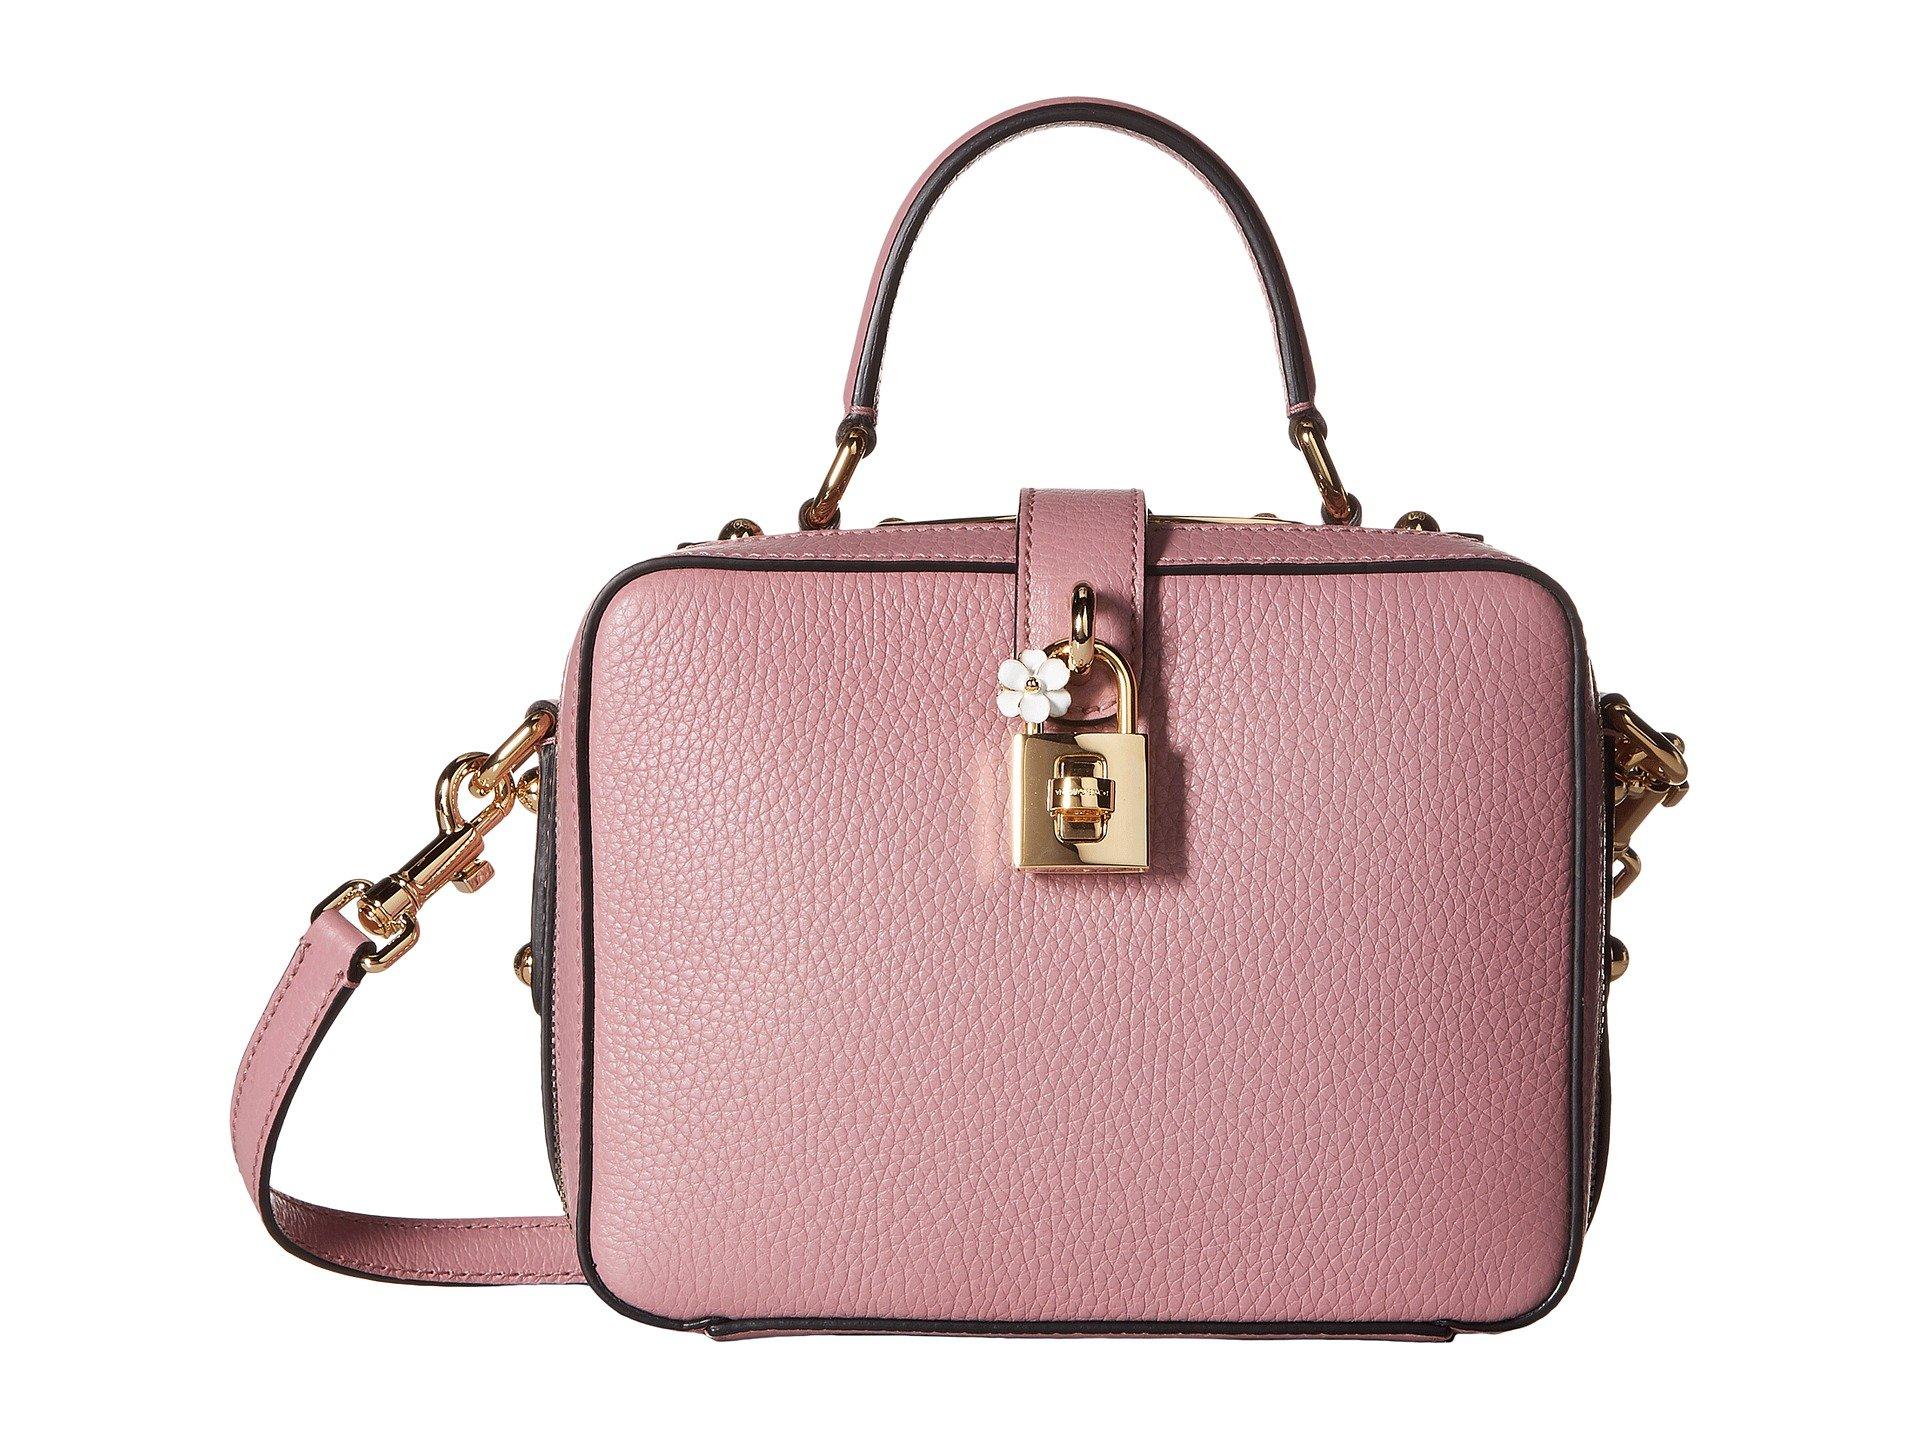 Bolso tipo Satchel para Mujer Dolce and Gabbana Top Handle Handbag  + Dolce & Gabbana en VeoyCompro.net